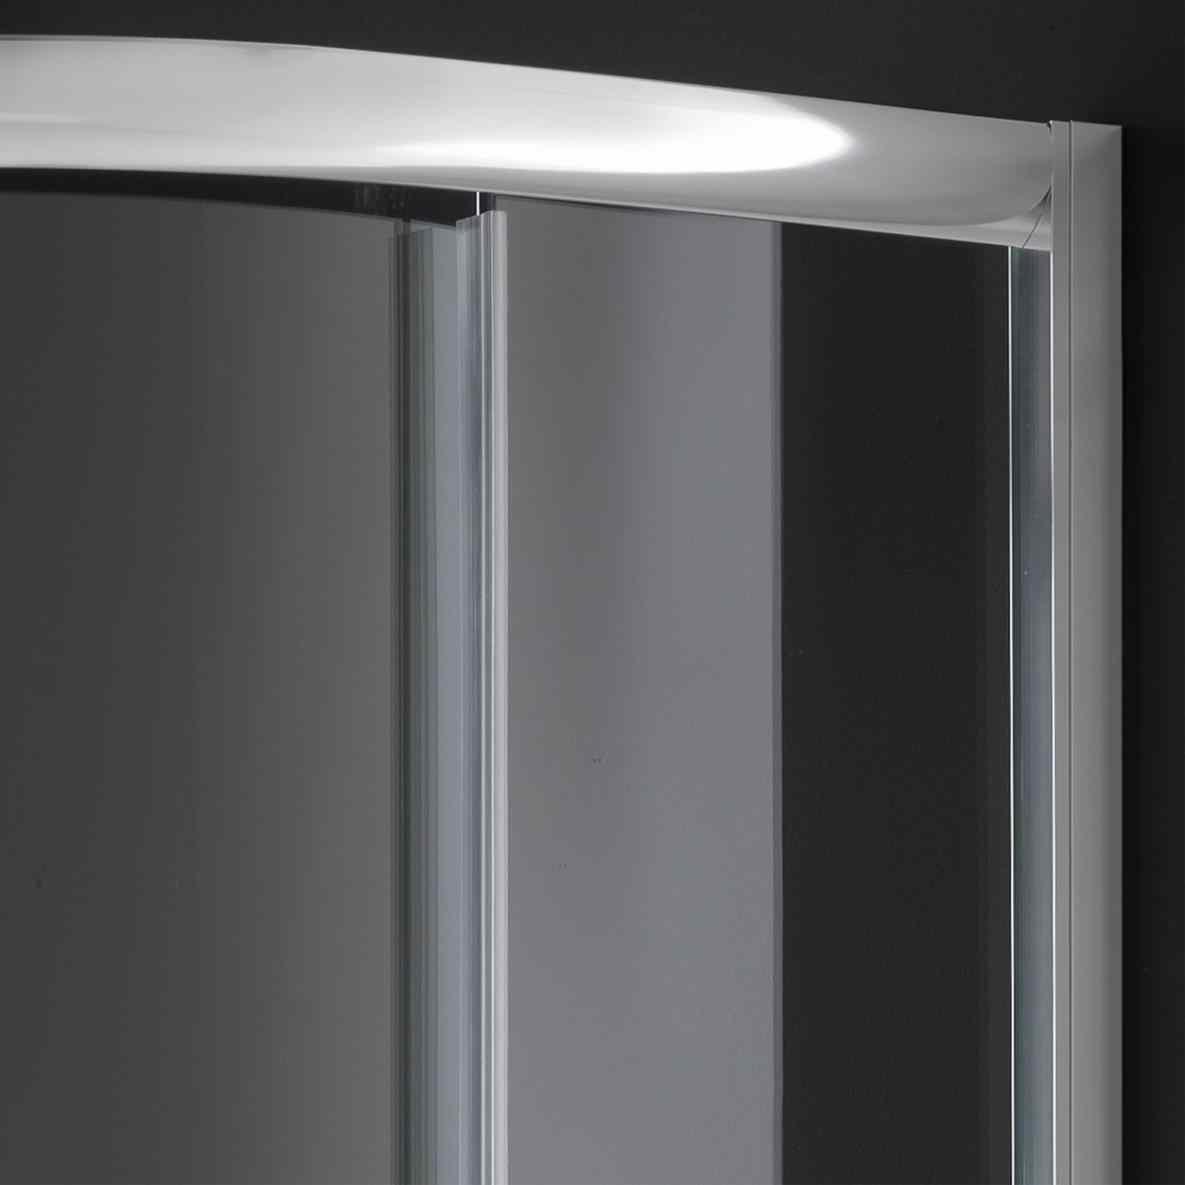 Diy Kitchen Cabinets Brisbane: Concertina Doors Bunnings & Room Partition Bunnings